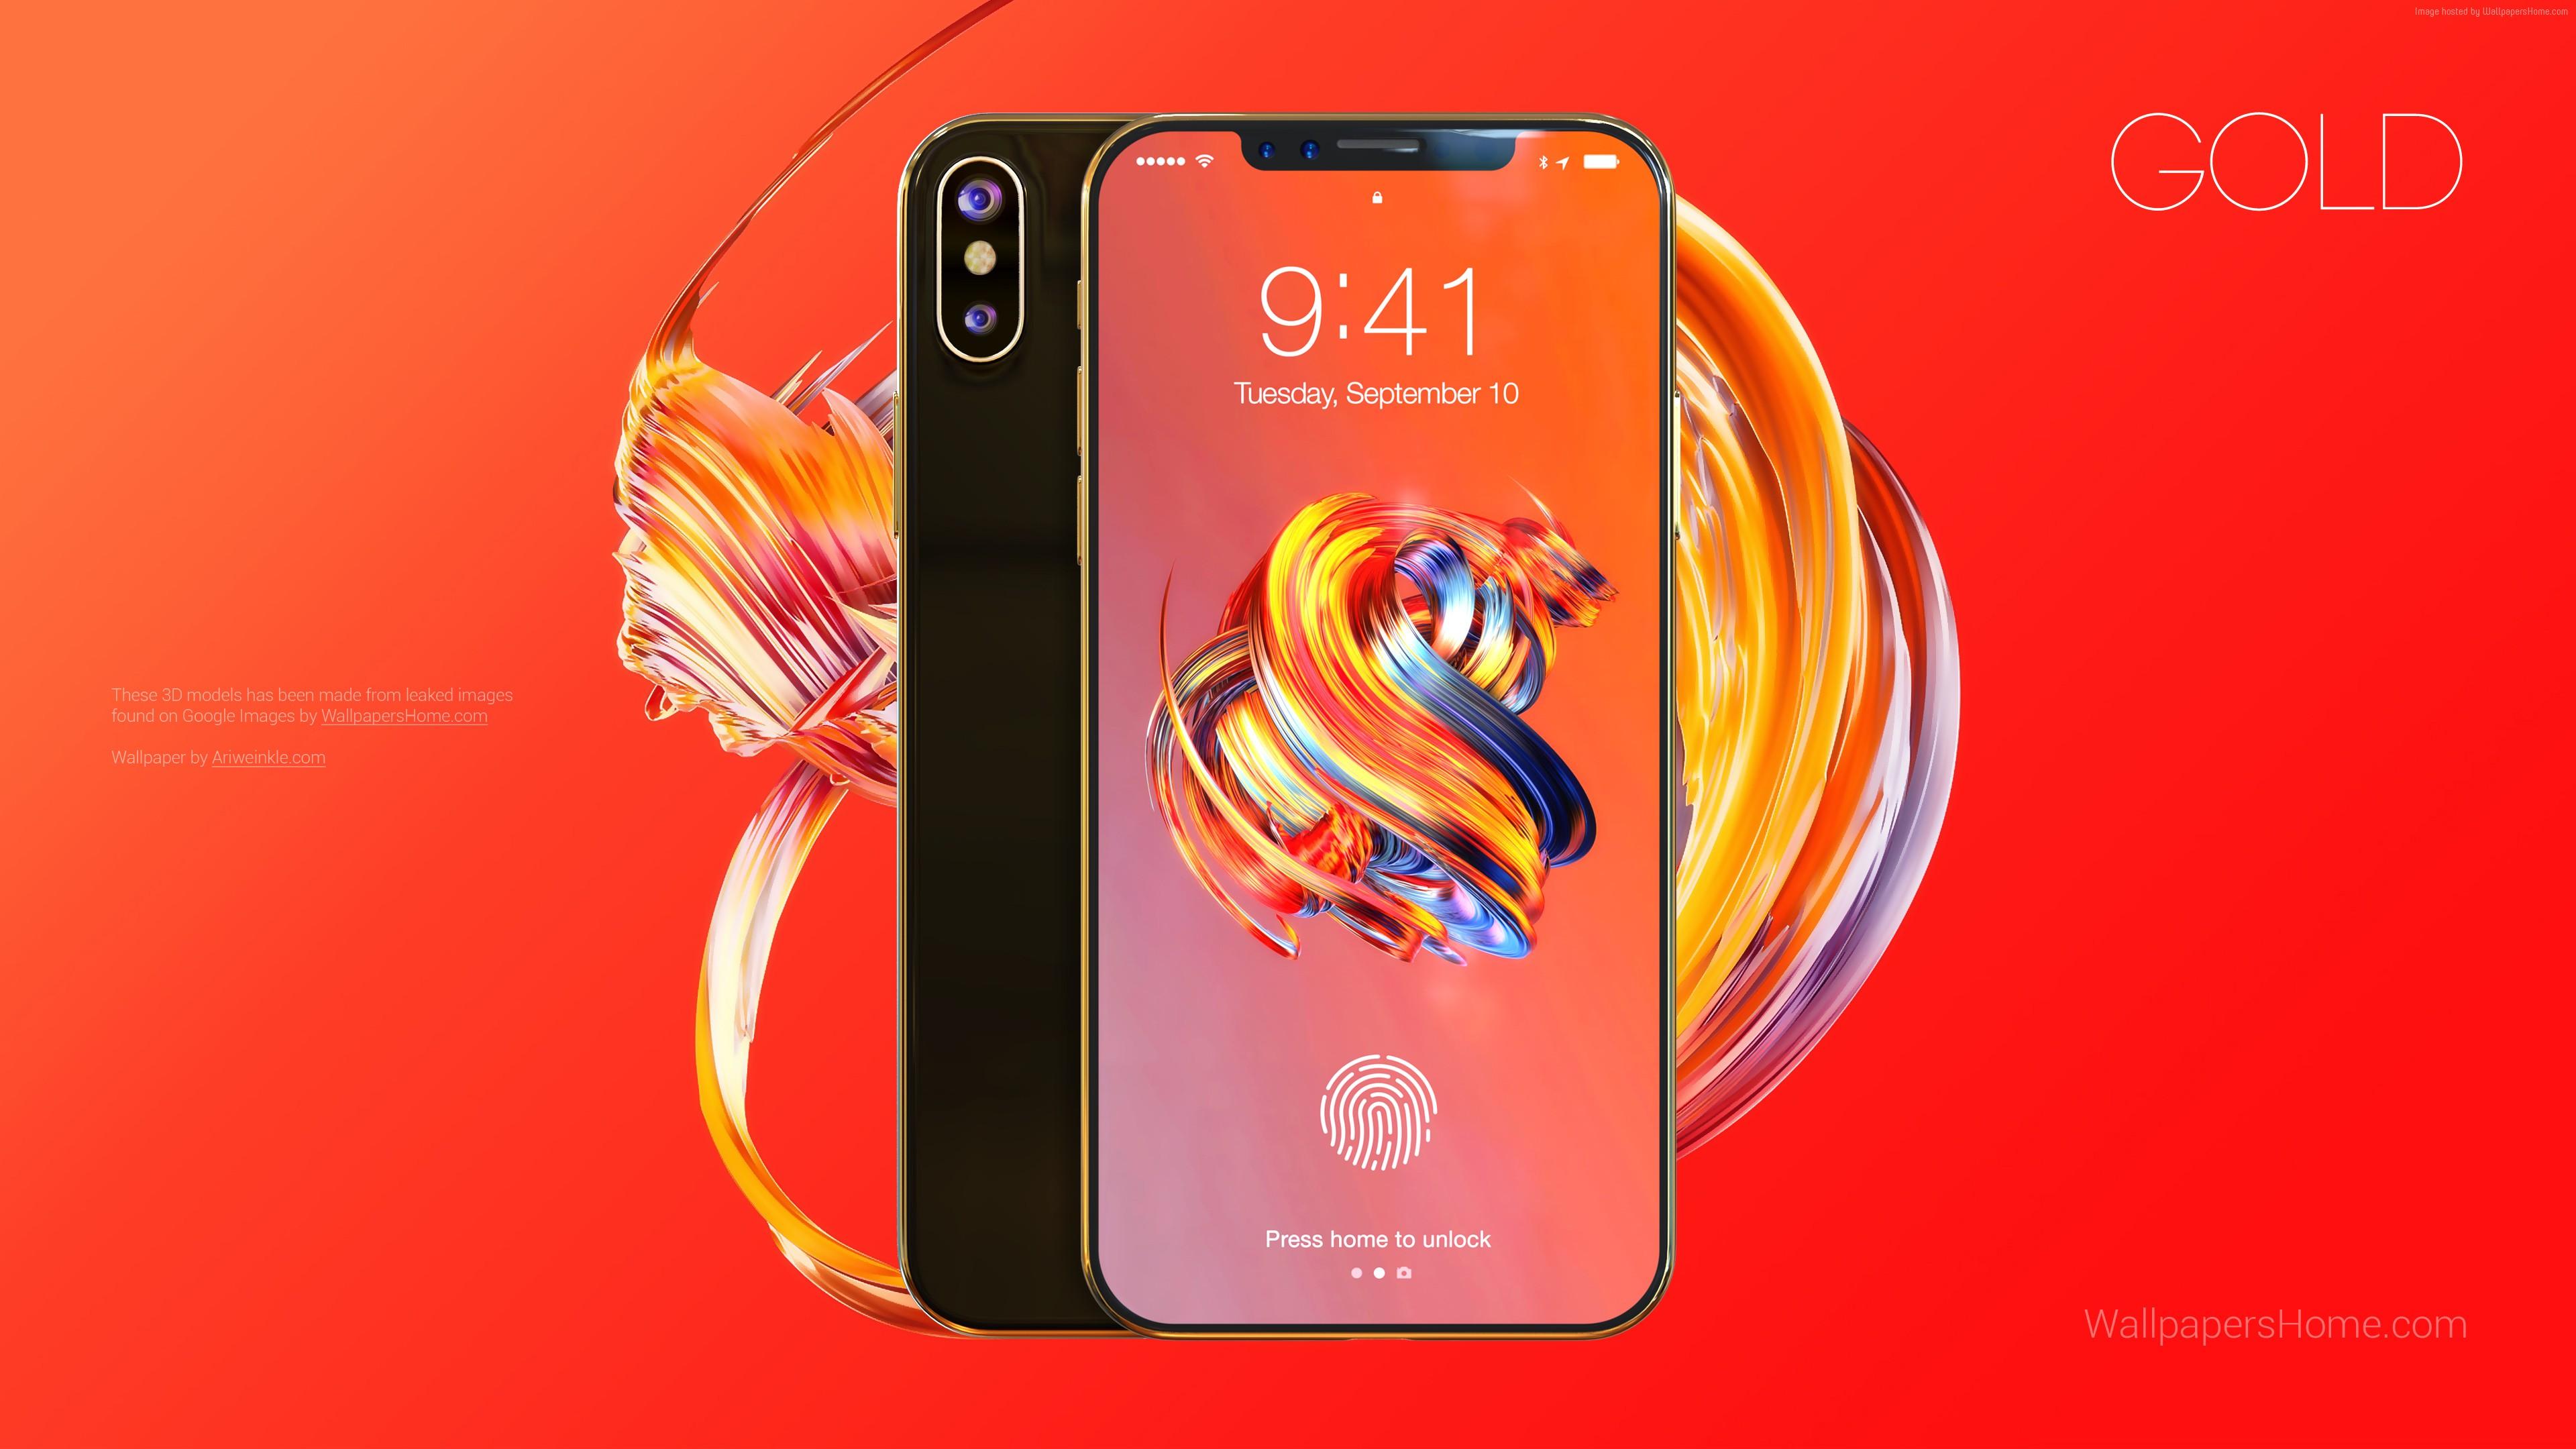 Wallpaper%20iPhone%20X,%20gold,%203D,%20leaked,%20WWDC%202017,%204k,%20Hi Tech%201794717064